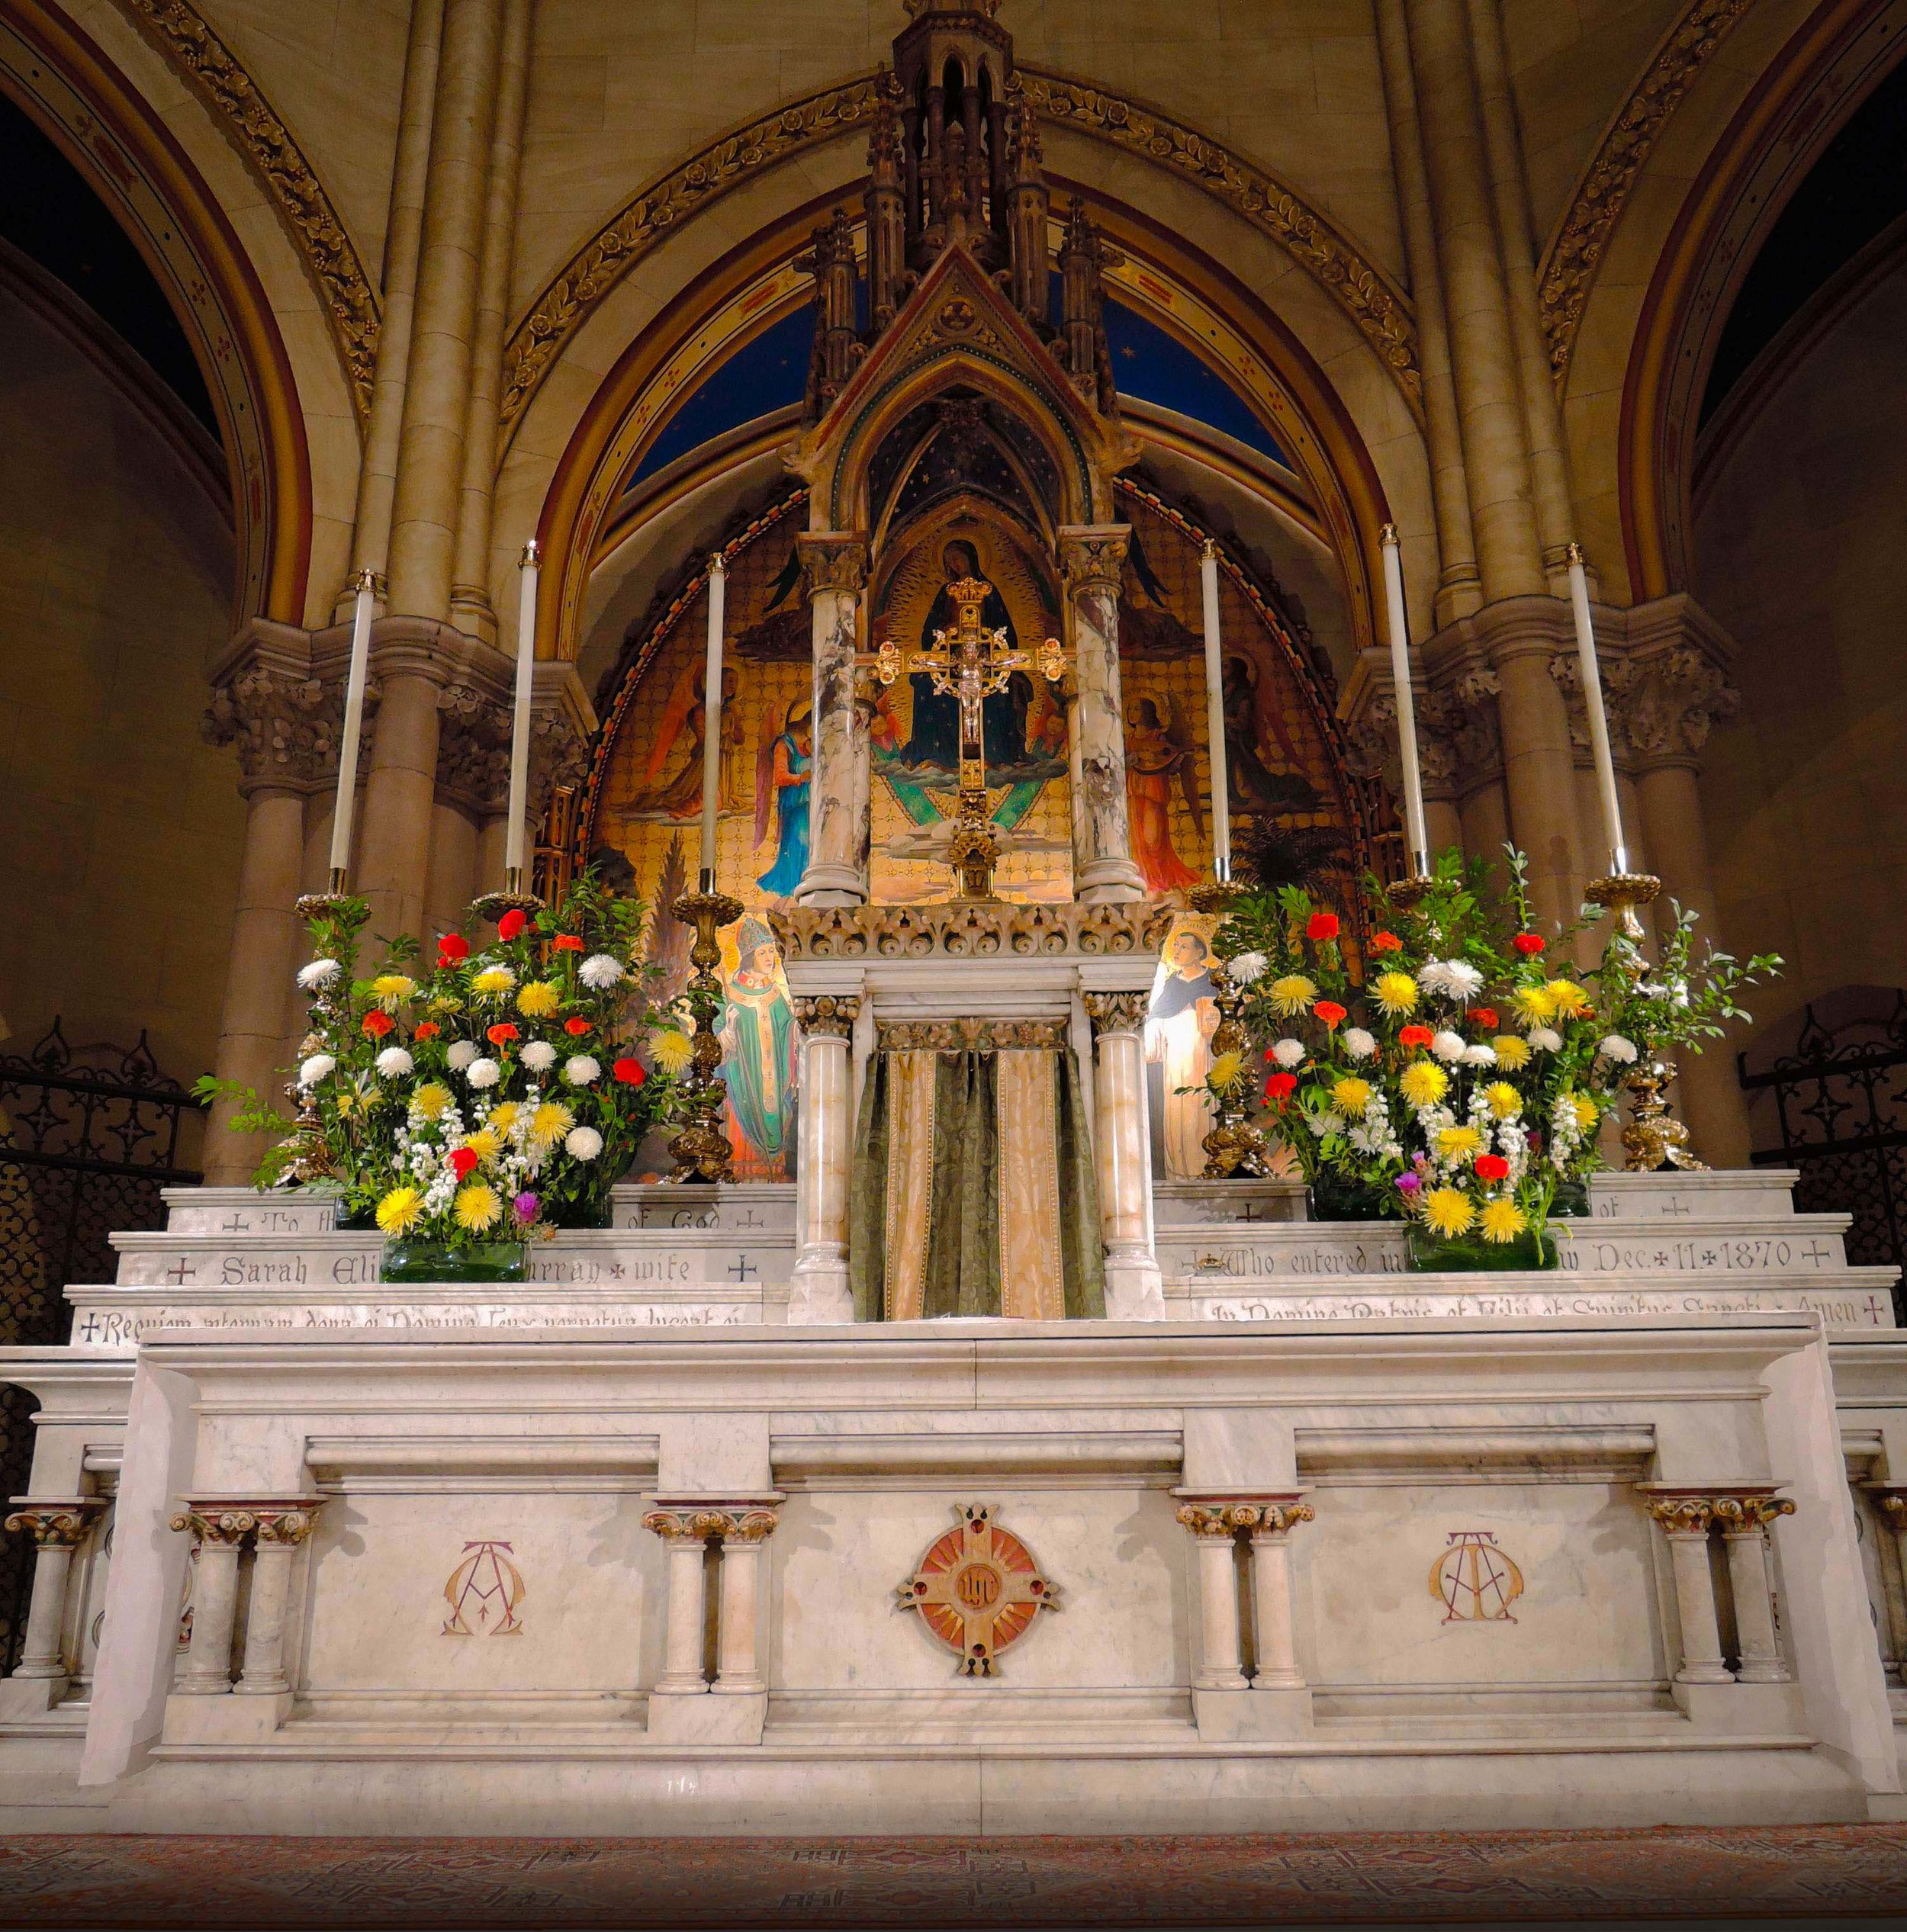 The High Altar, Sunday, June 25, 2017